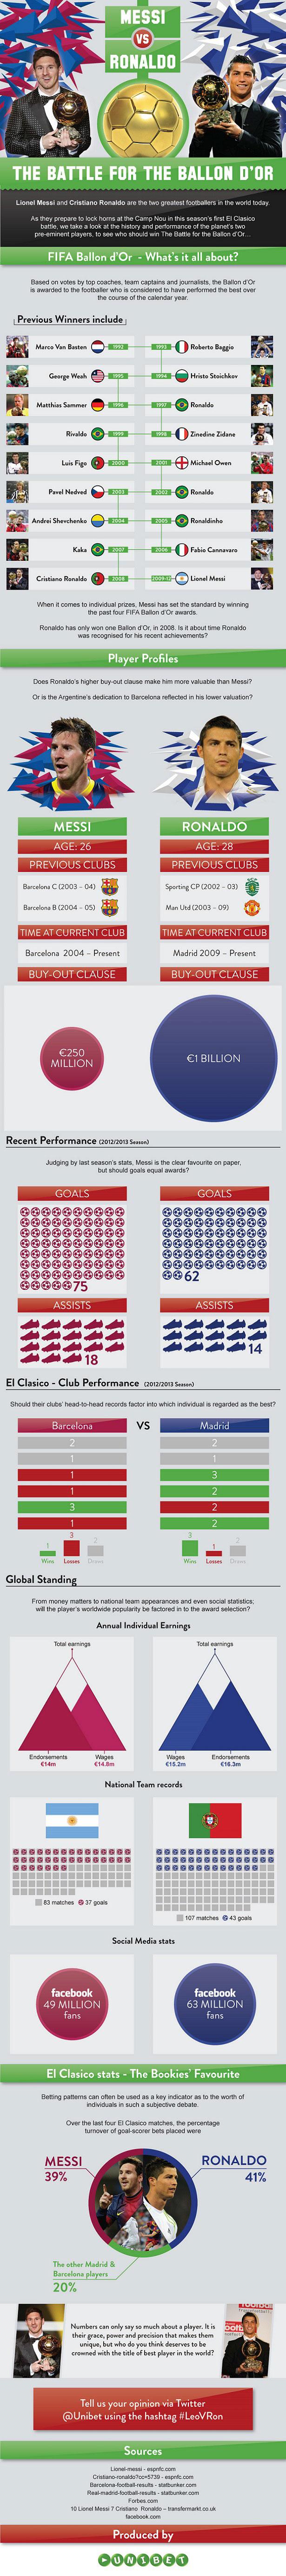 Messi or Ronaldo for Ballon d'Or 2013-Infographic